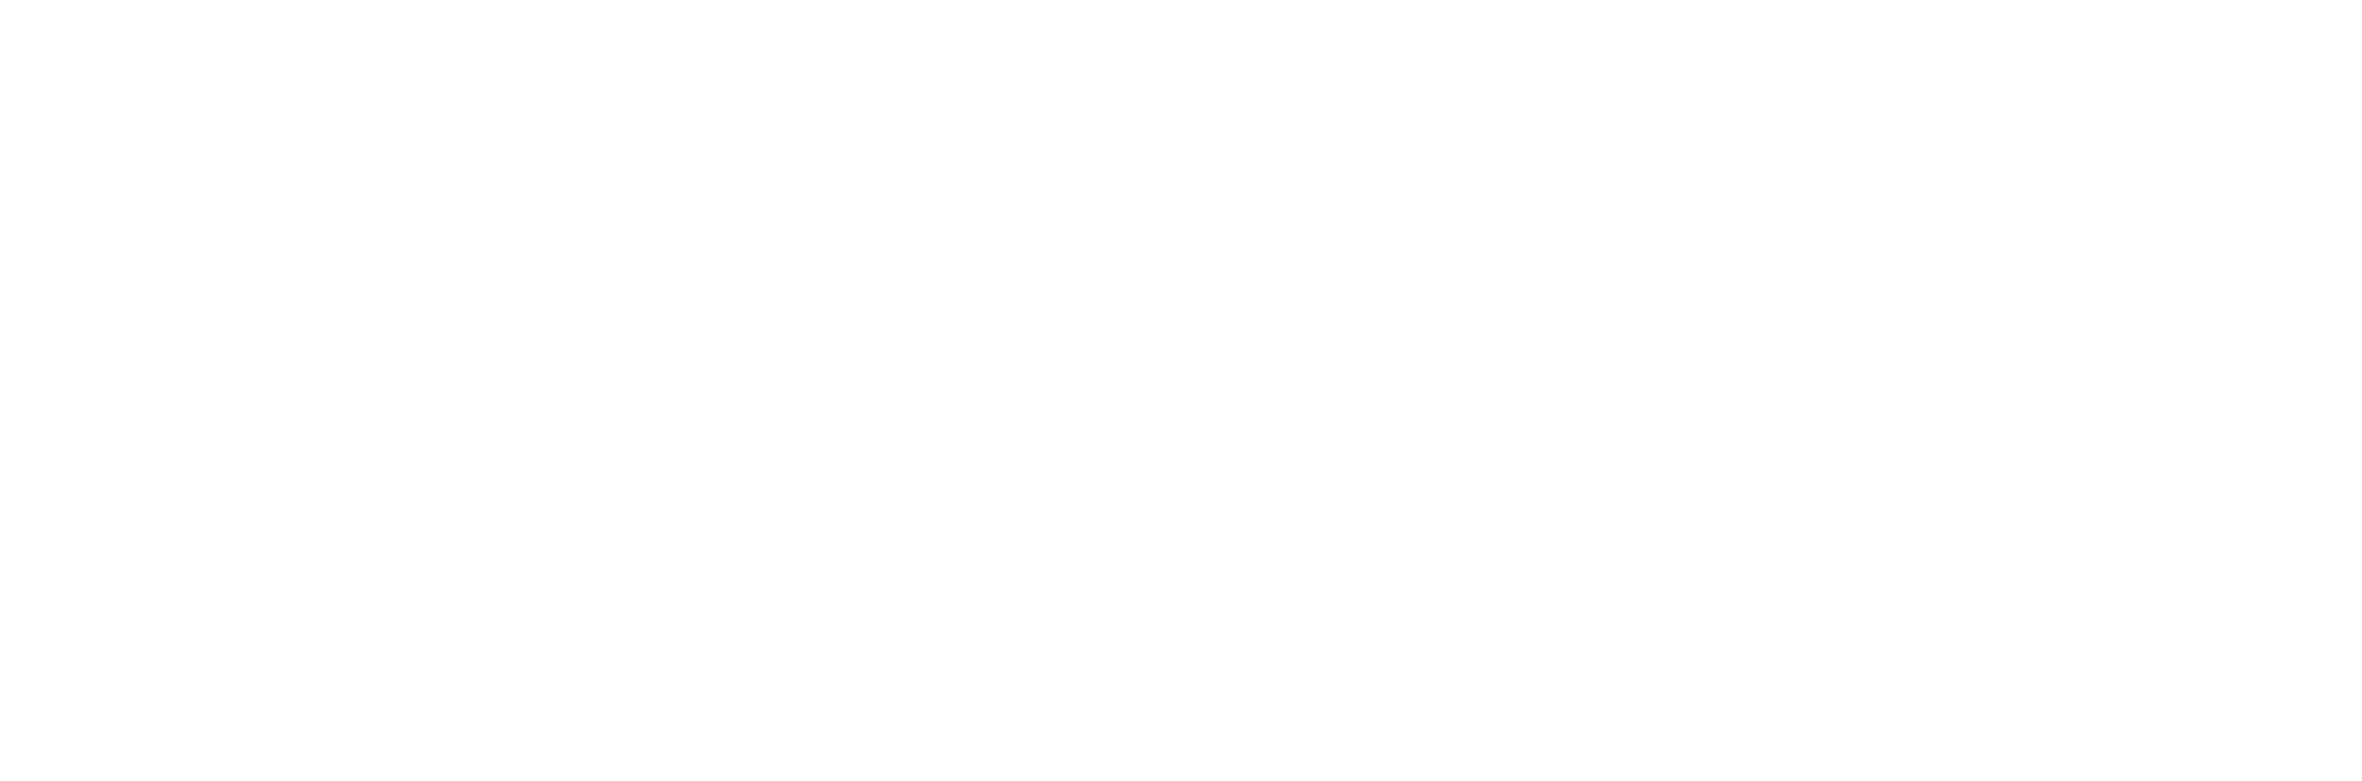 venaclase-01.png